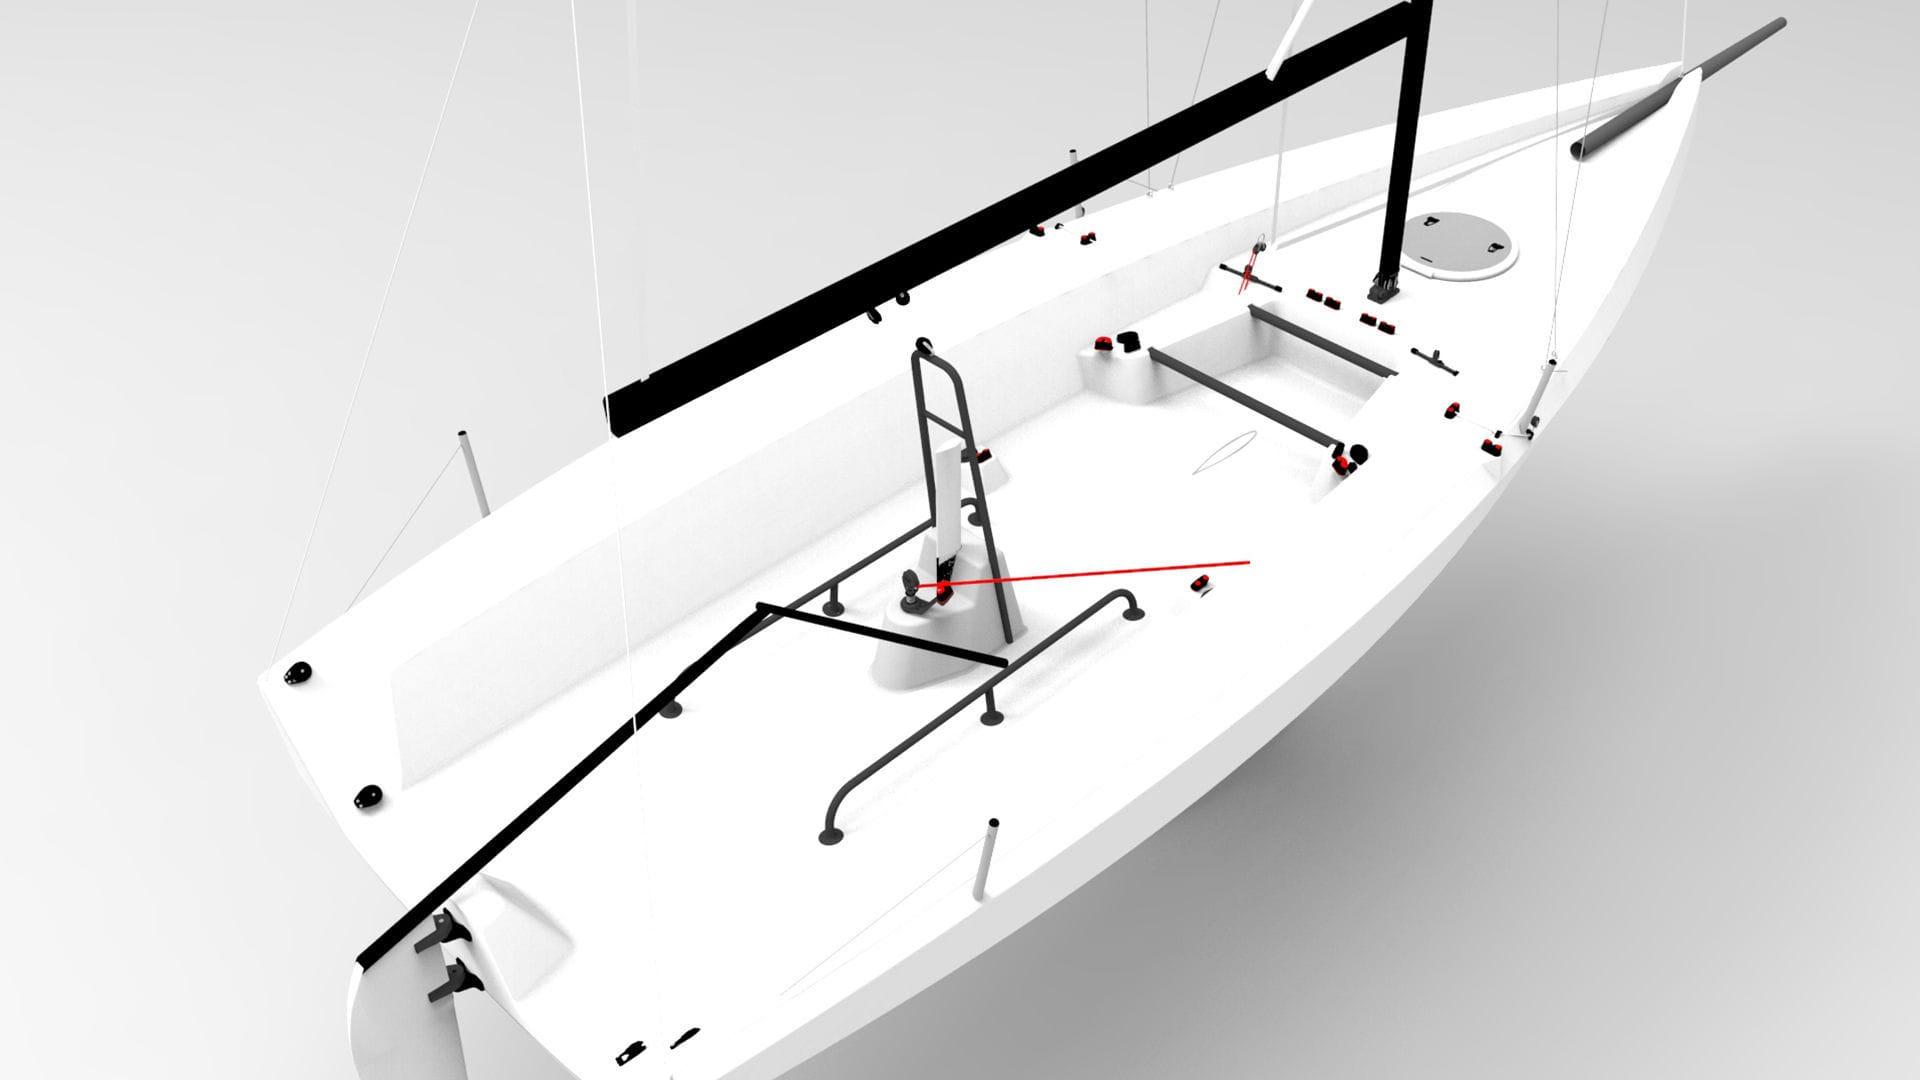 hight resolution of  monohull sport keelboat racing open transom